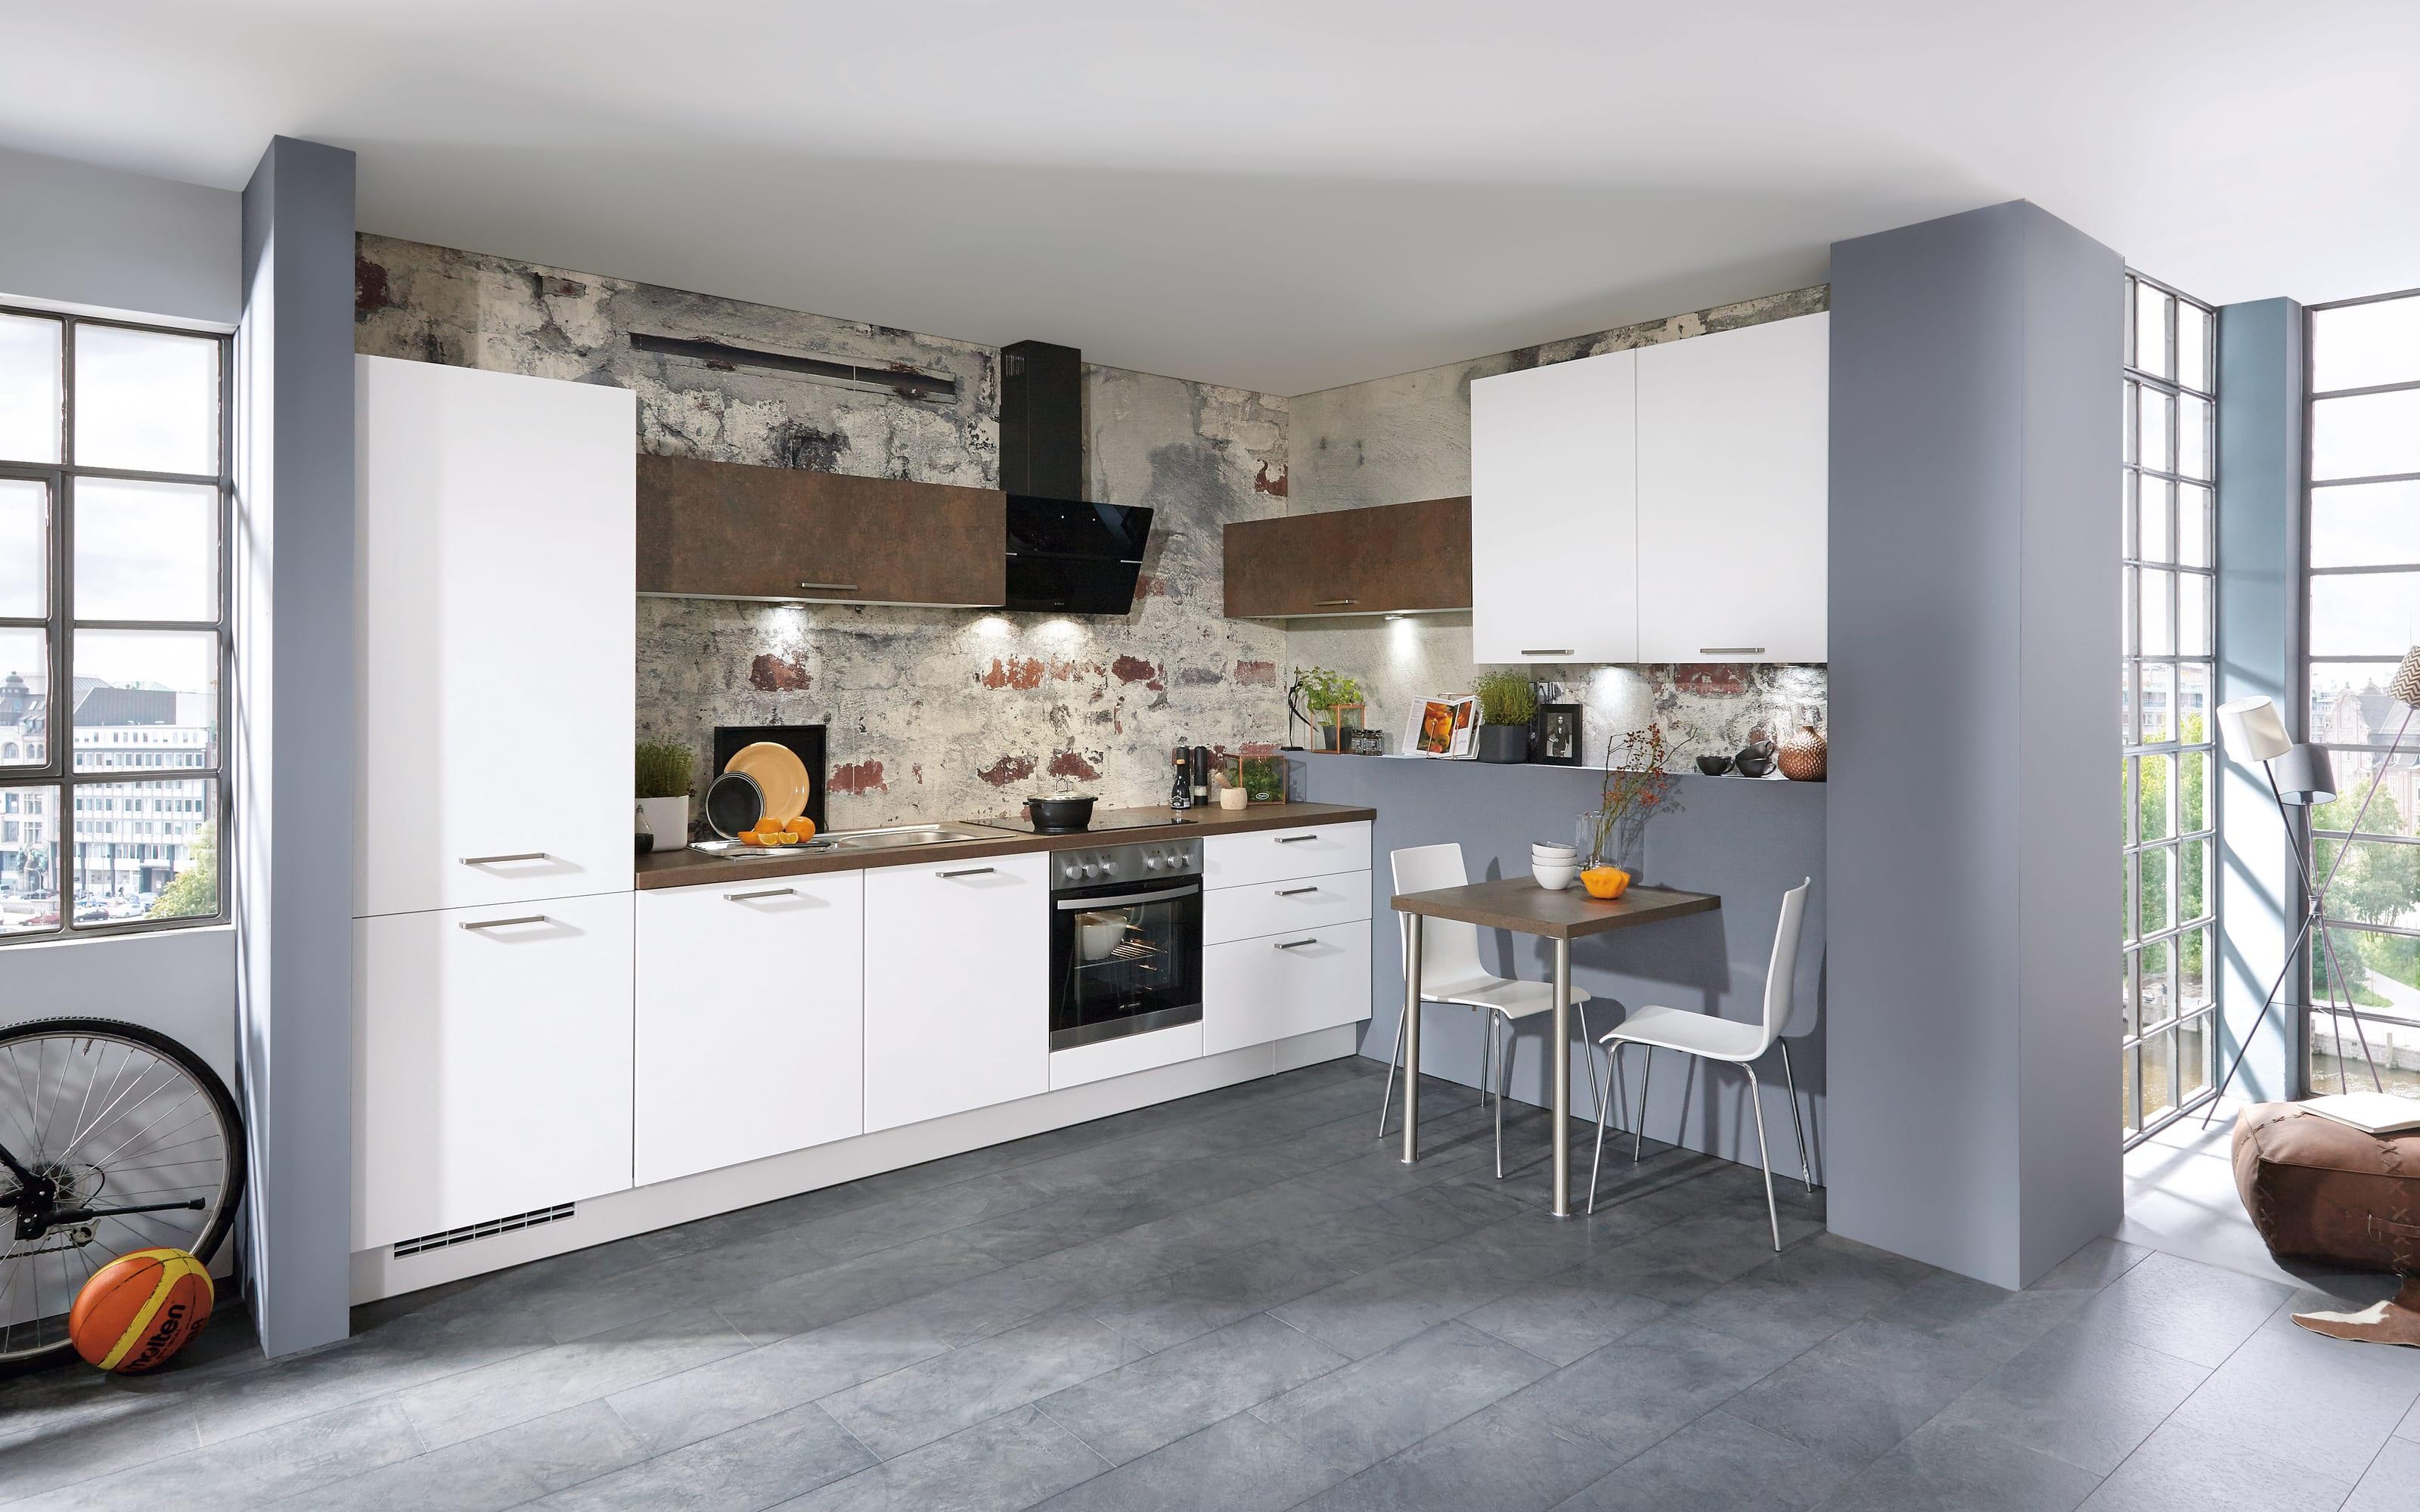 Einbauküche Touch, Lacklaminat alpinweiß supermatt, inklusive Elektrogeräte, inklusive AEG Geschirrspüler